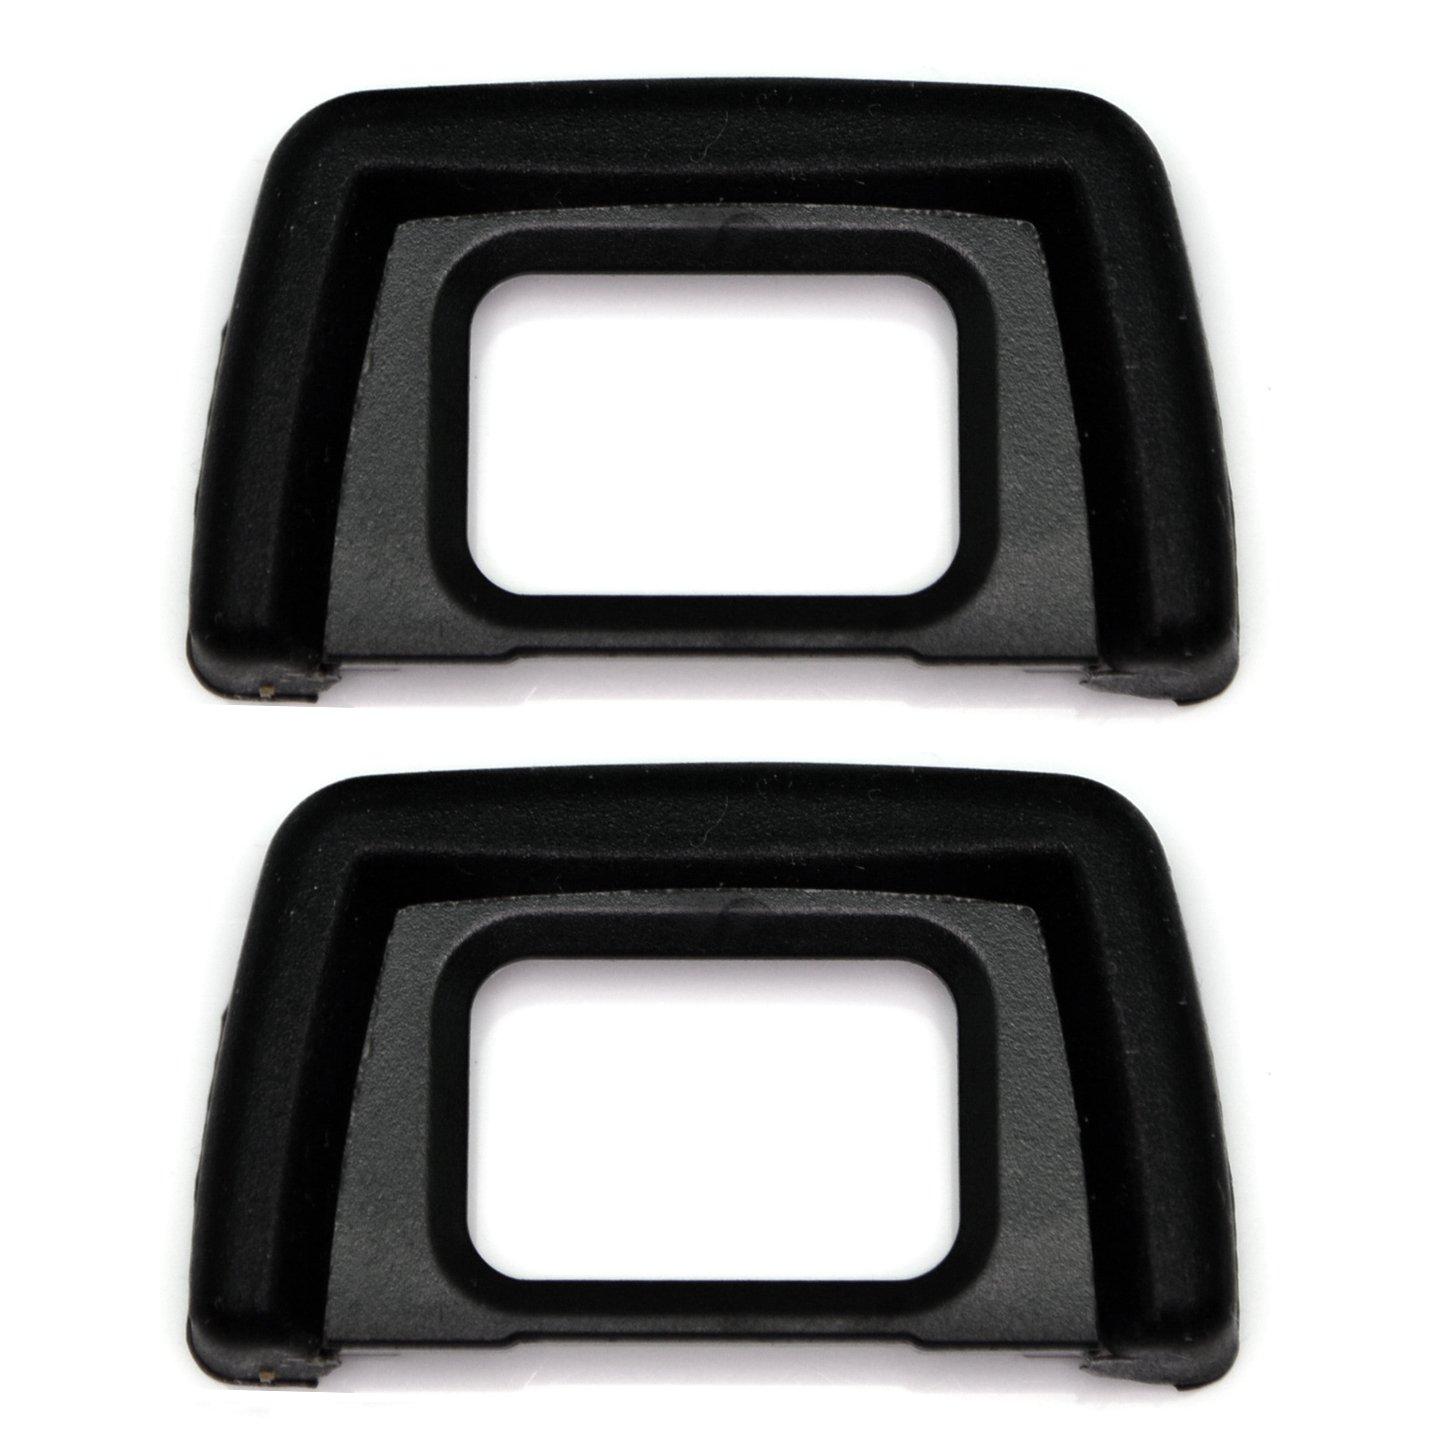 [PACK of 2] Replacement DK-24 for Nikon Rubber Eyecup D5000 D5100 D3000 D31004 5minTECH